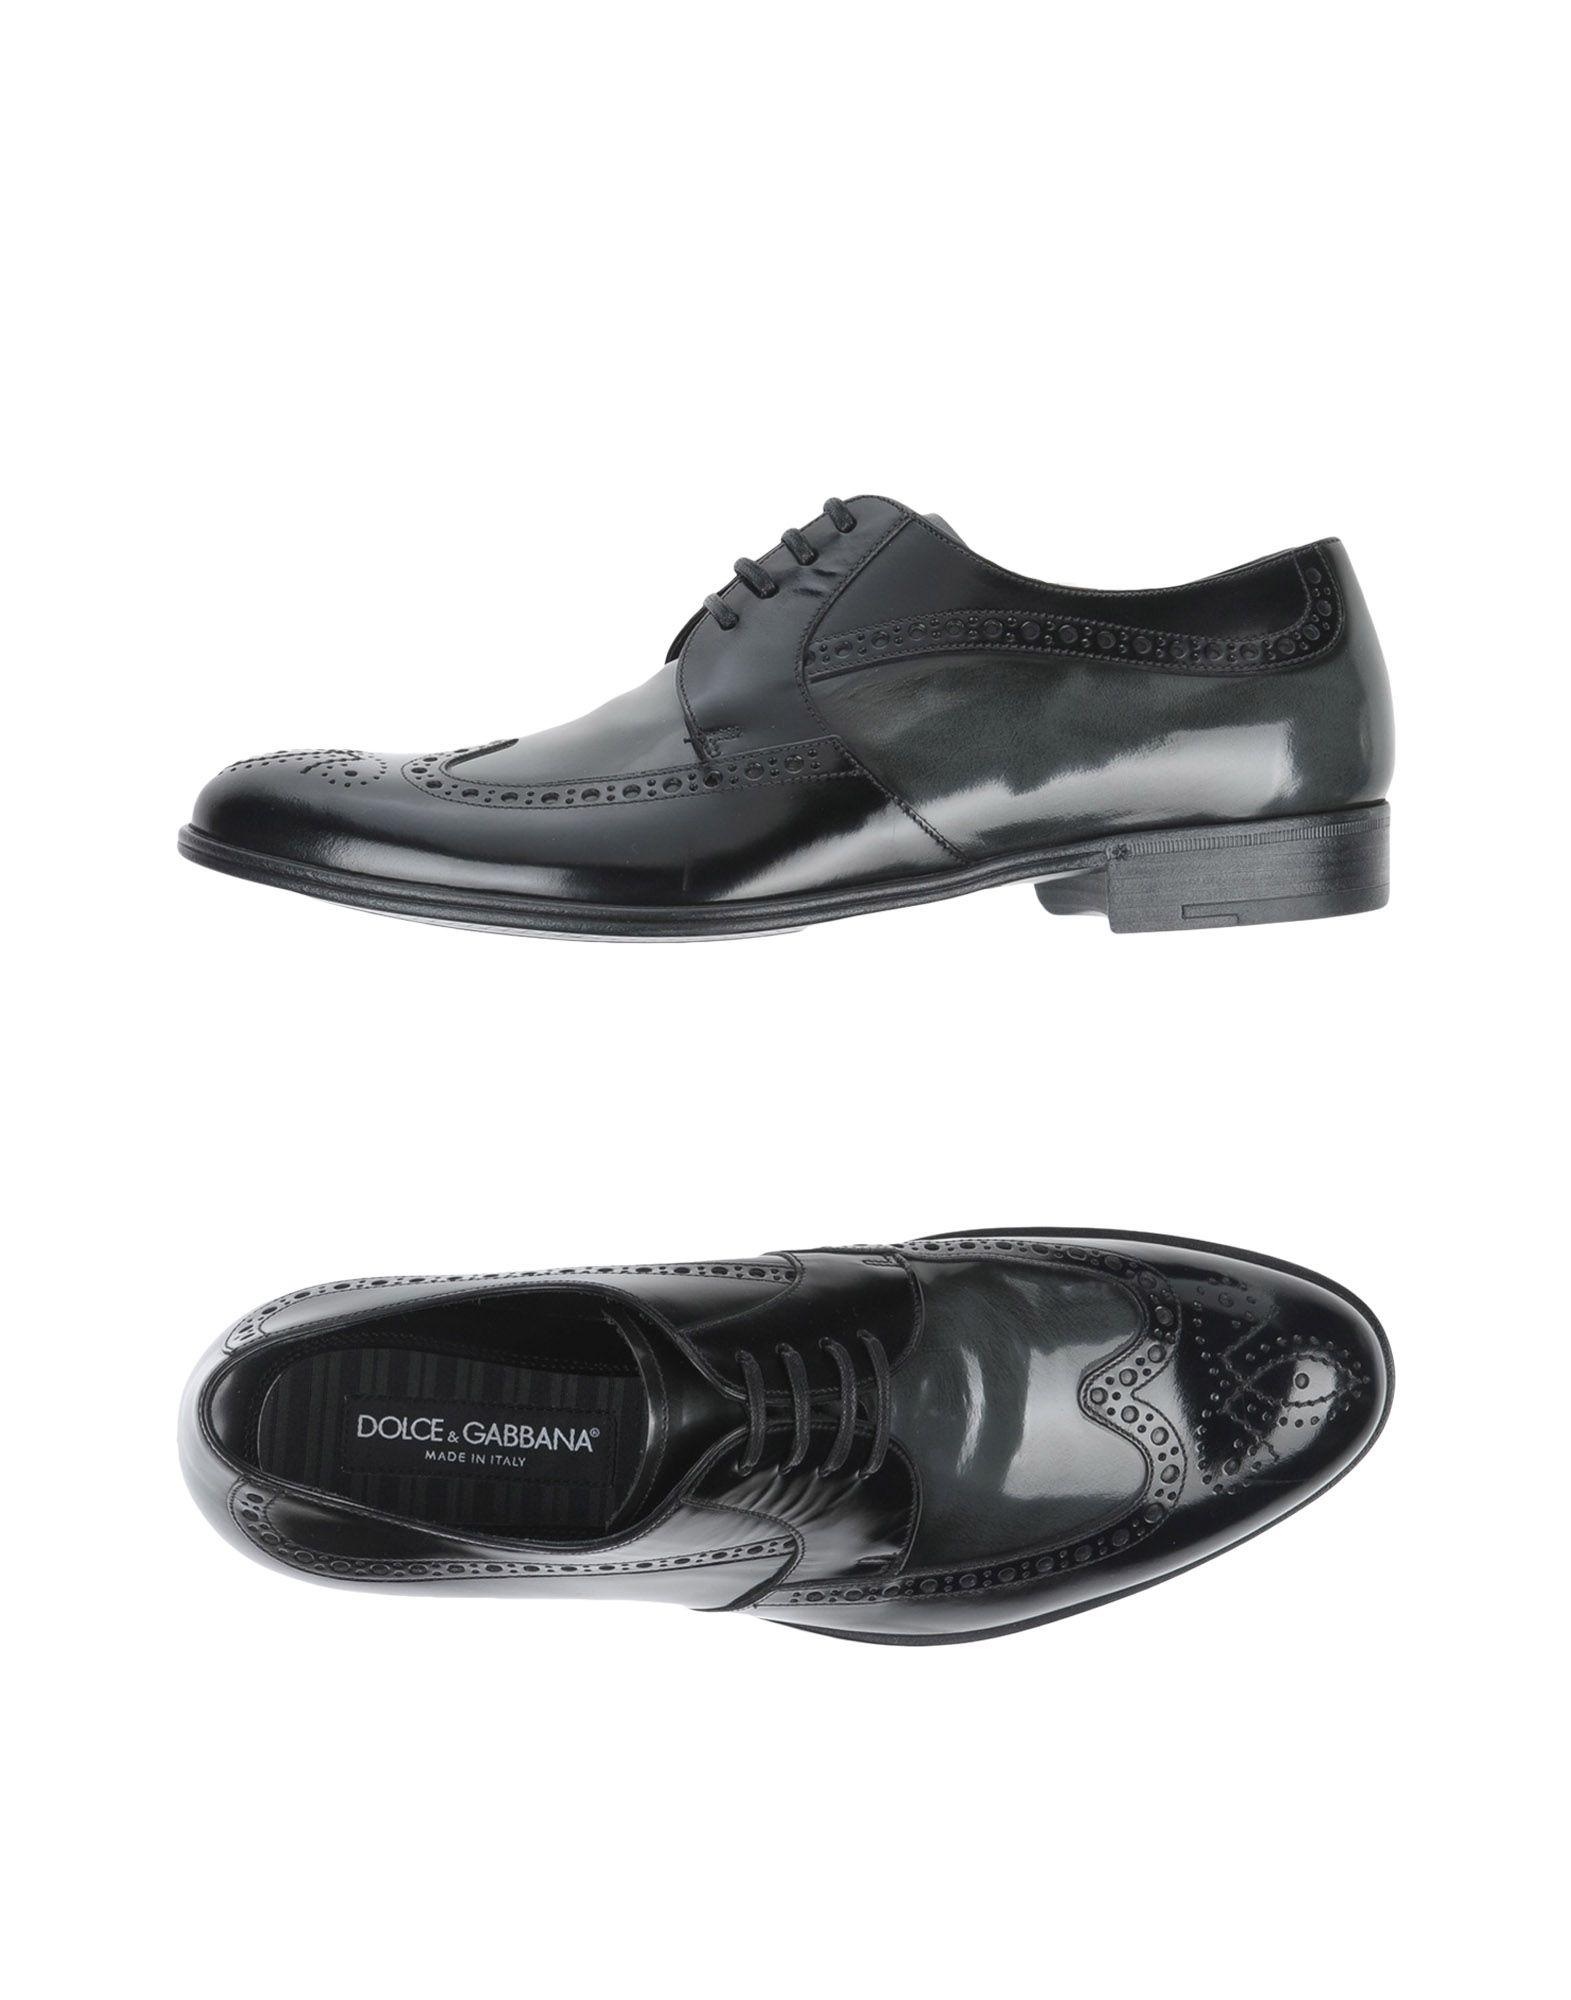 Dolce & Gabbana Schnürschuhe Herren  11400574RA Gute Qualität beliebte Schuhe